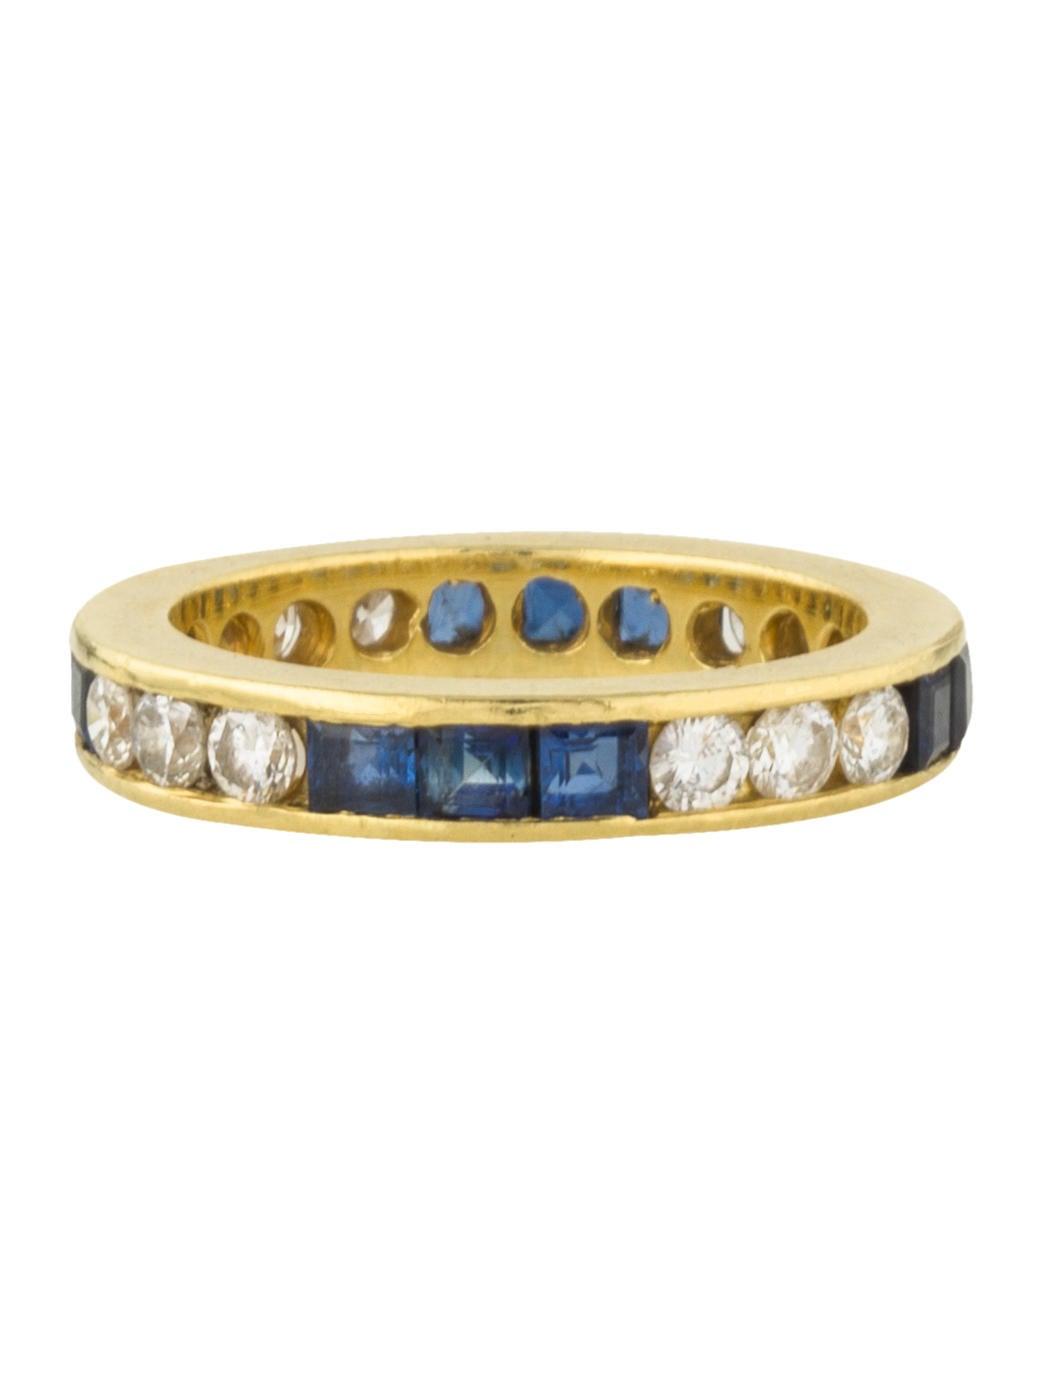 18k sapphire eternity band rings rring39241